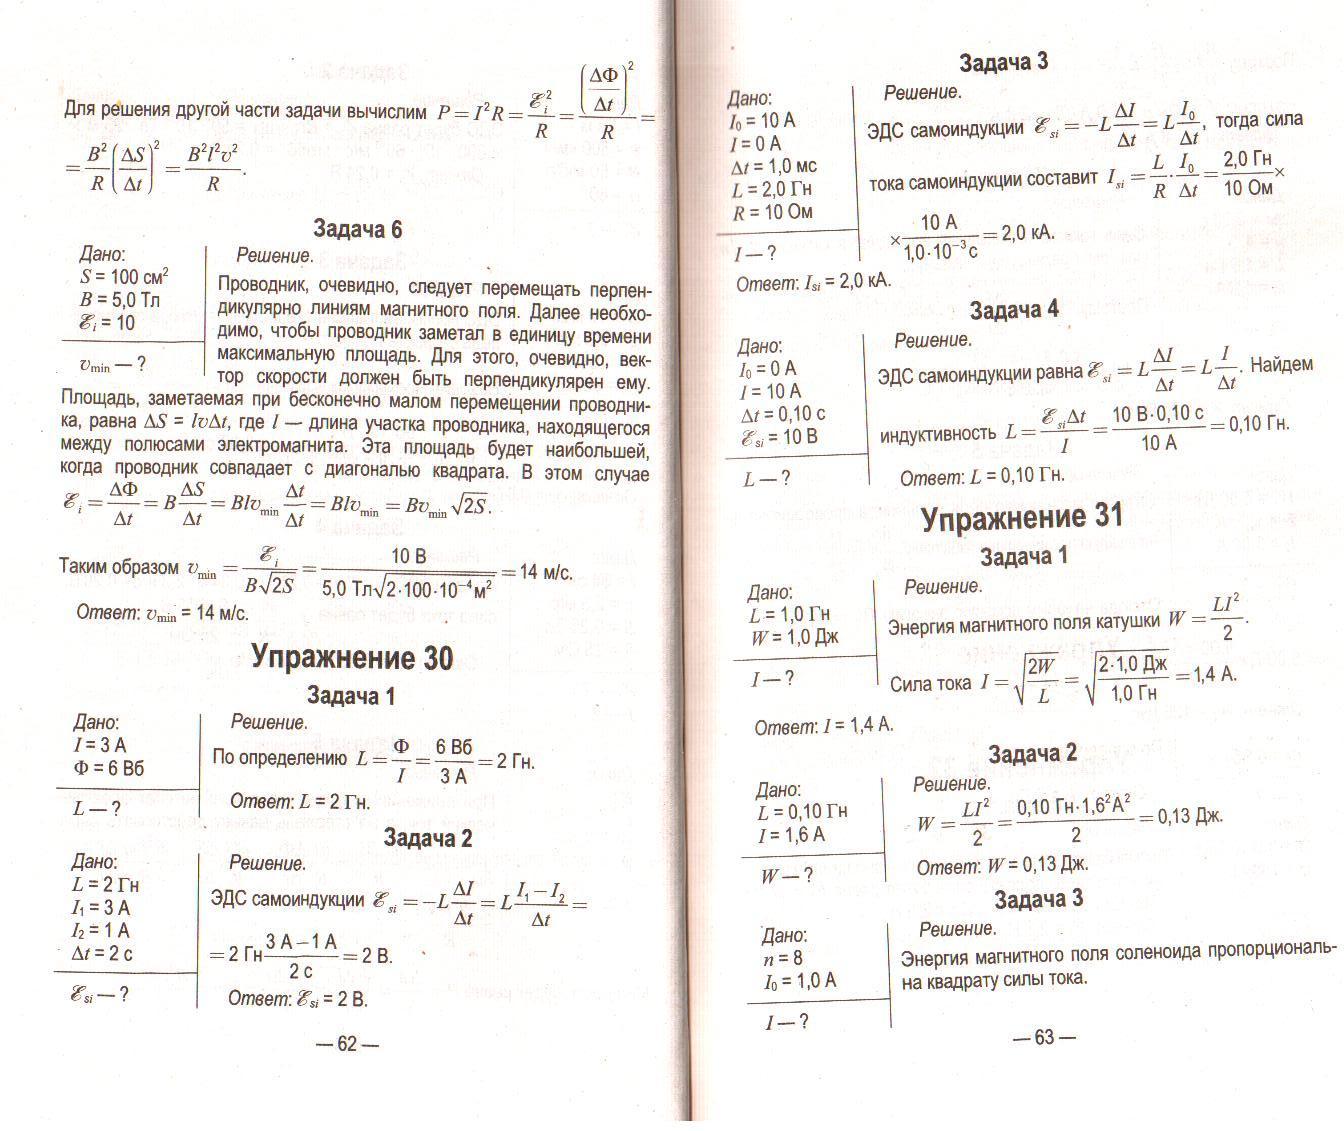 Решебник по физике 10 класс. Страницы 12